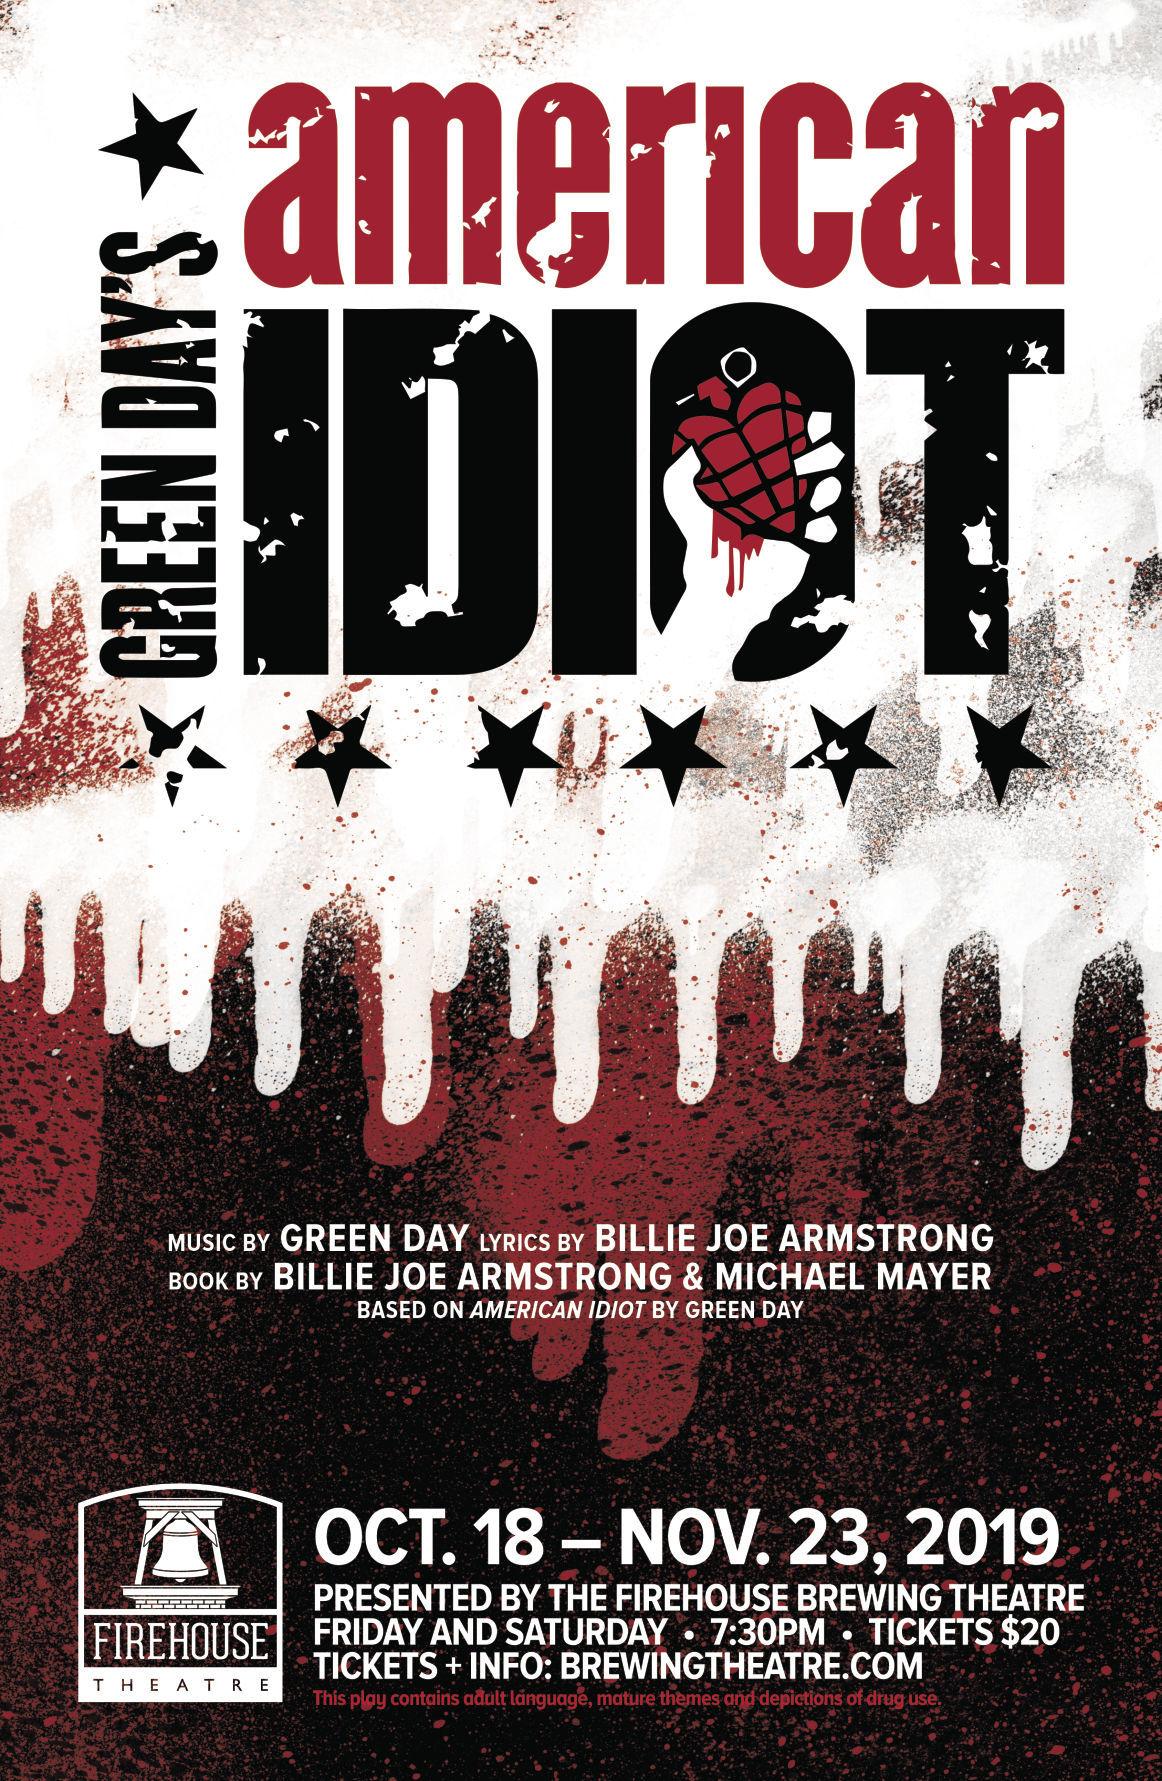 American Idiot - 11 x 17 Poster.jpg